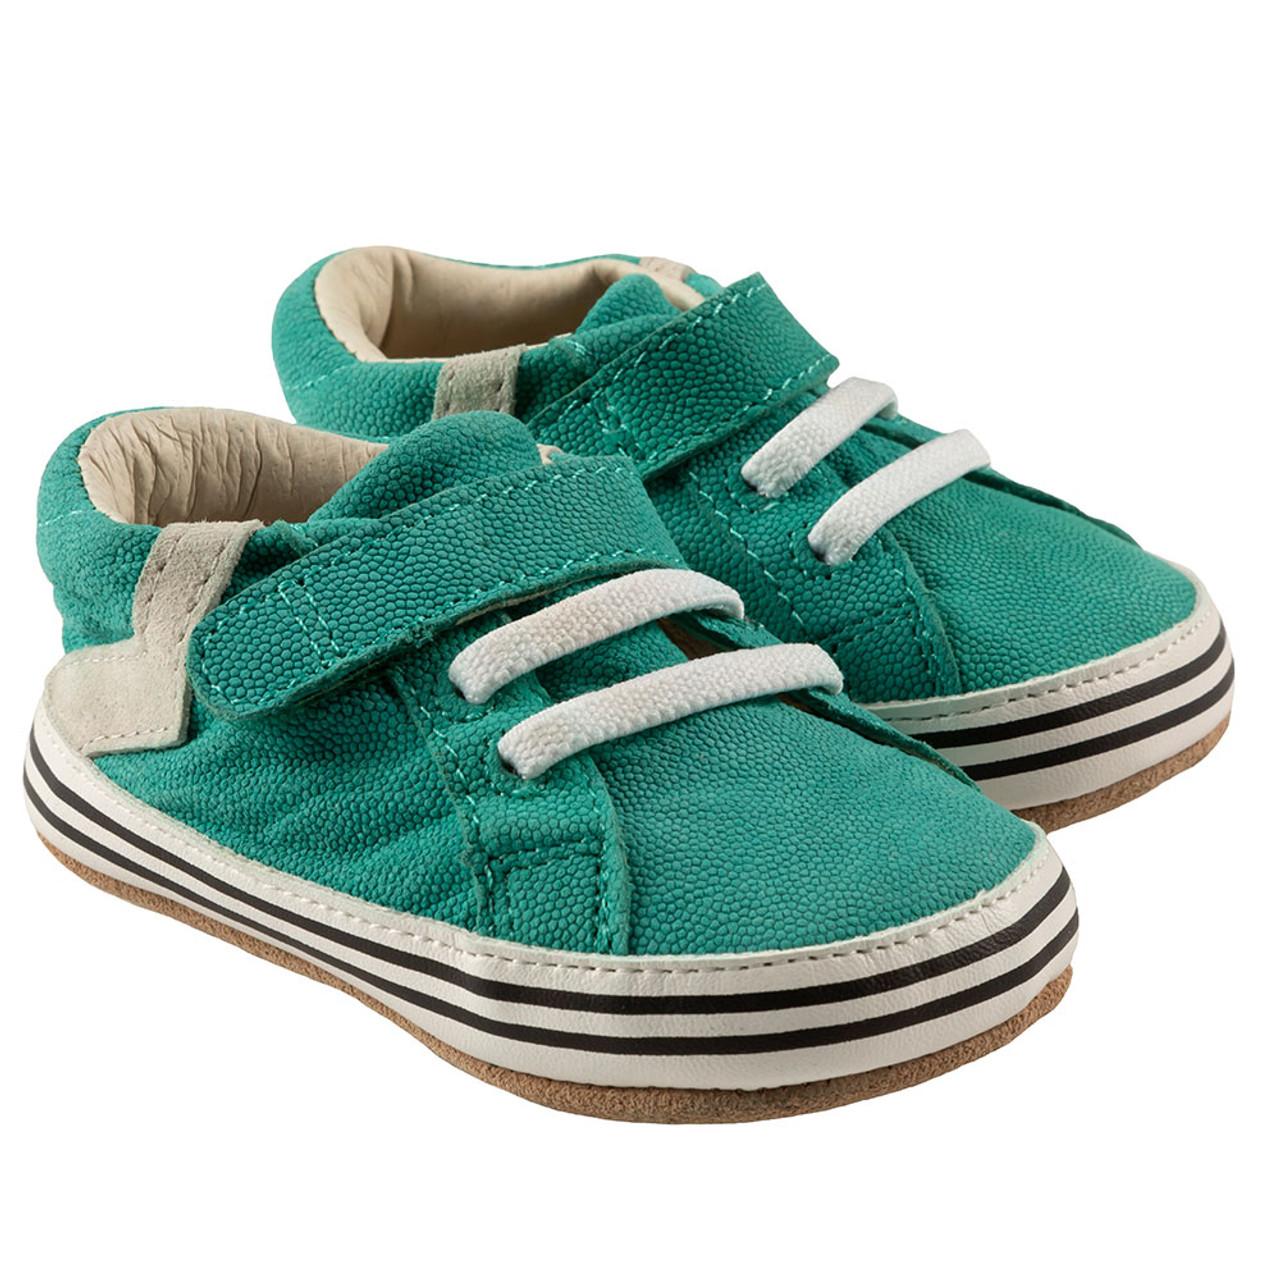 Adam Green Leather| First Kicks | Baby